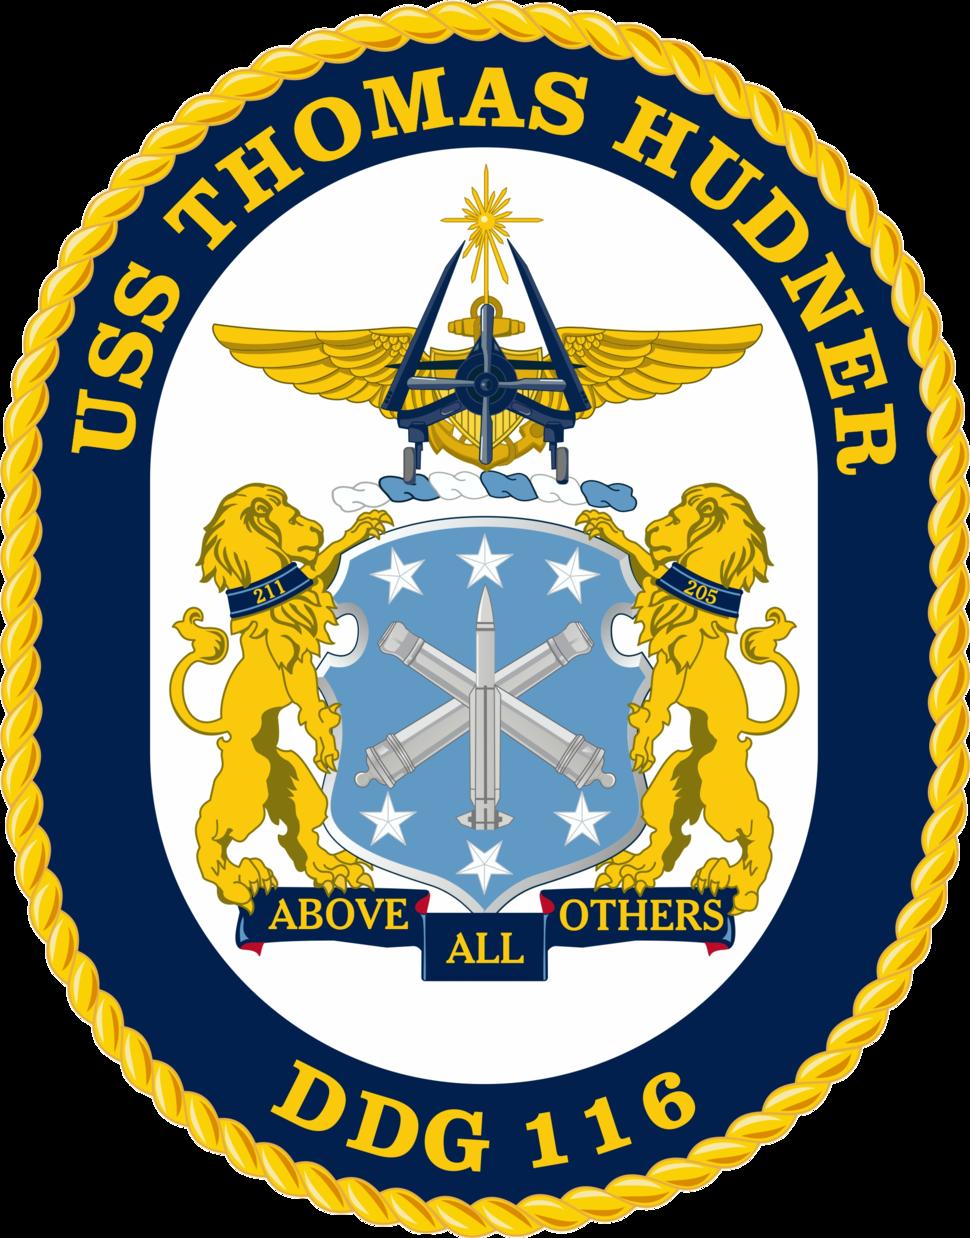 USS Thomas Hudner DDG-116 Crest